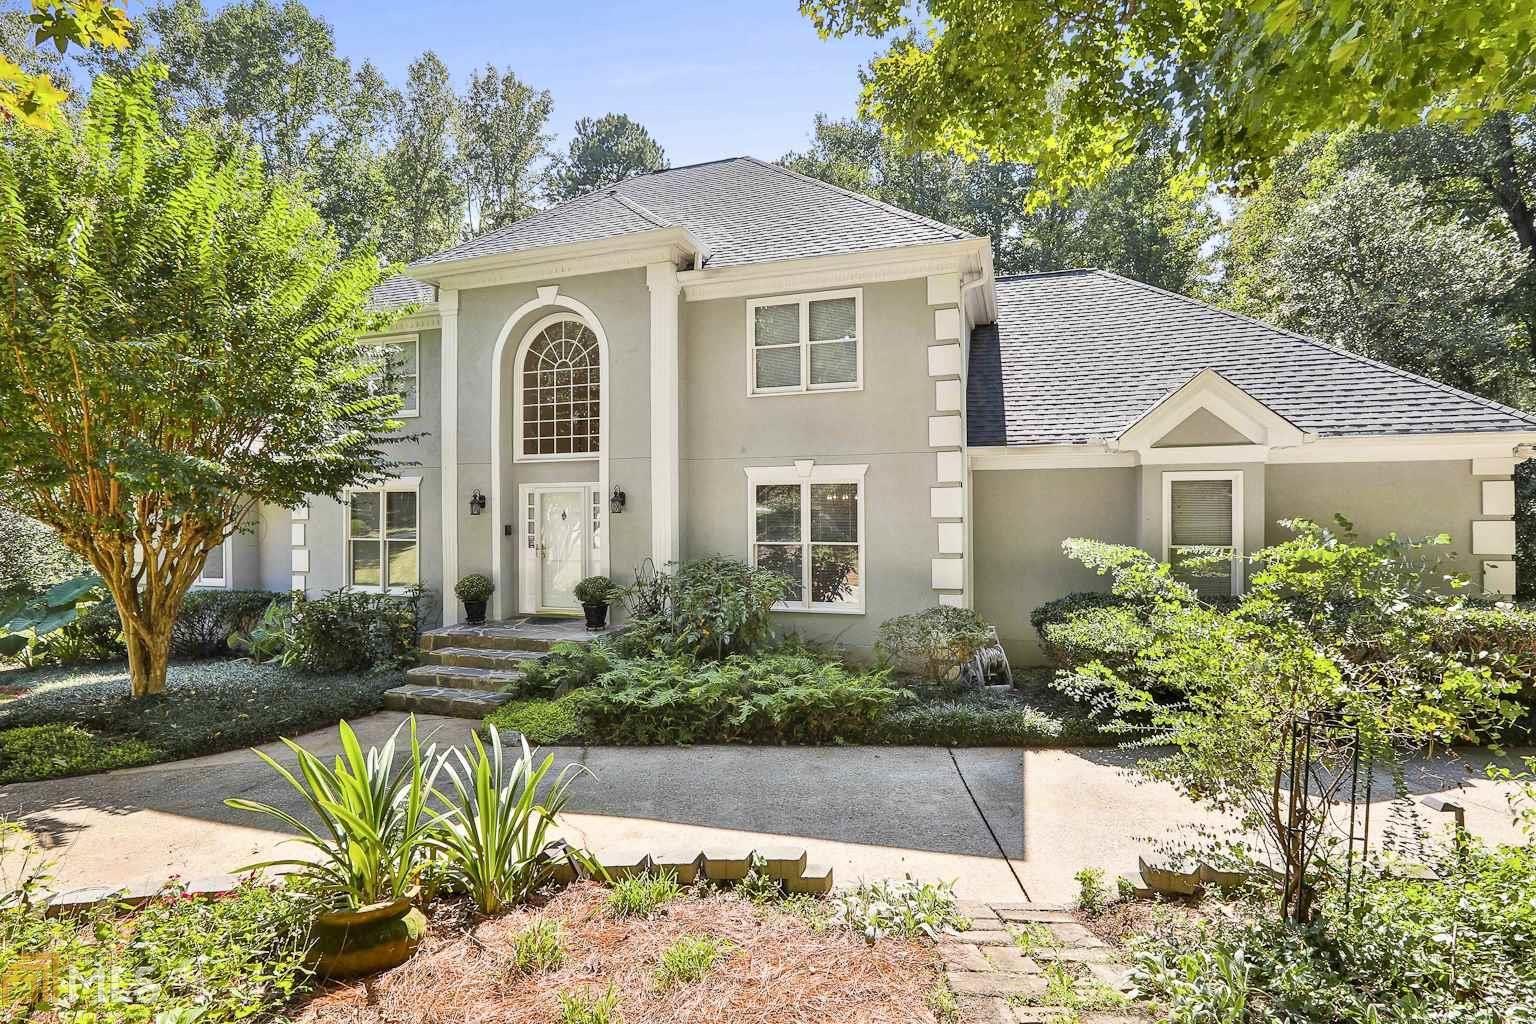 140 Pond, Fayetteville, GA 30215 - MLS#: 8869839